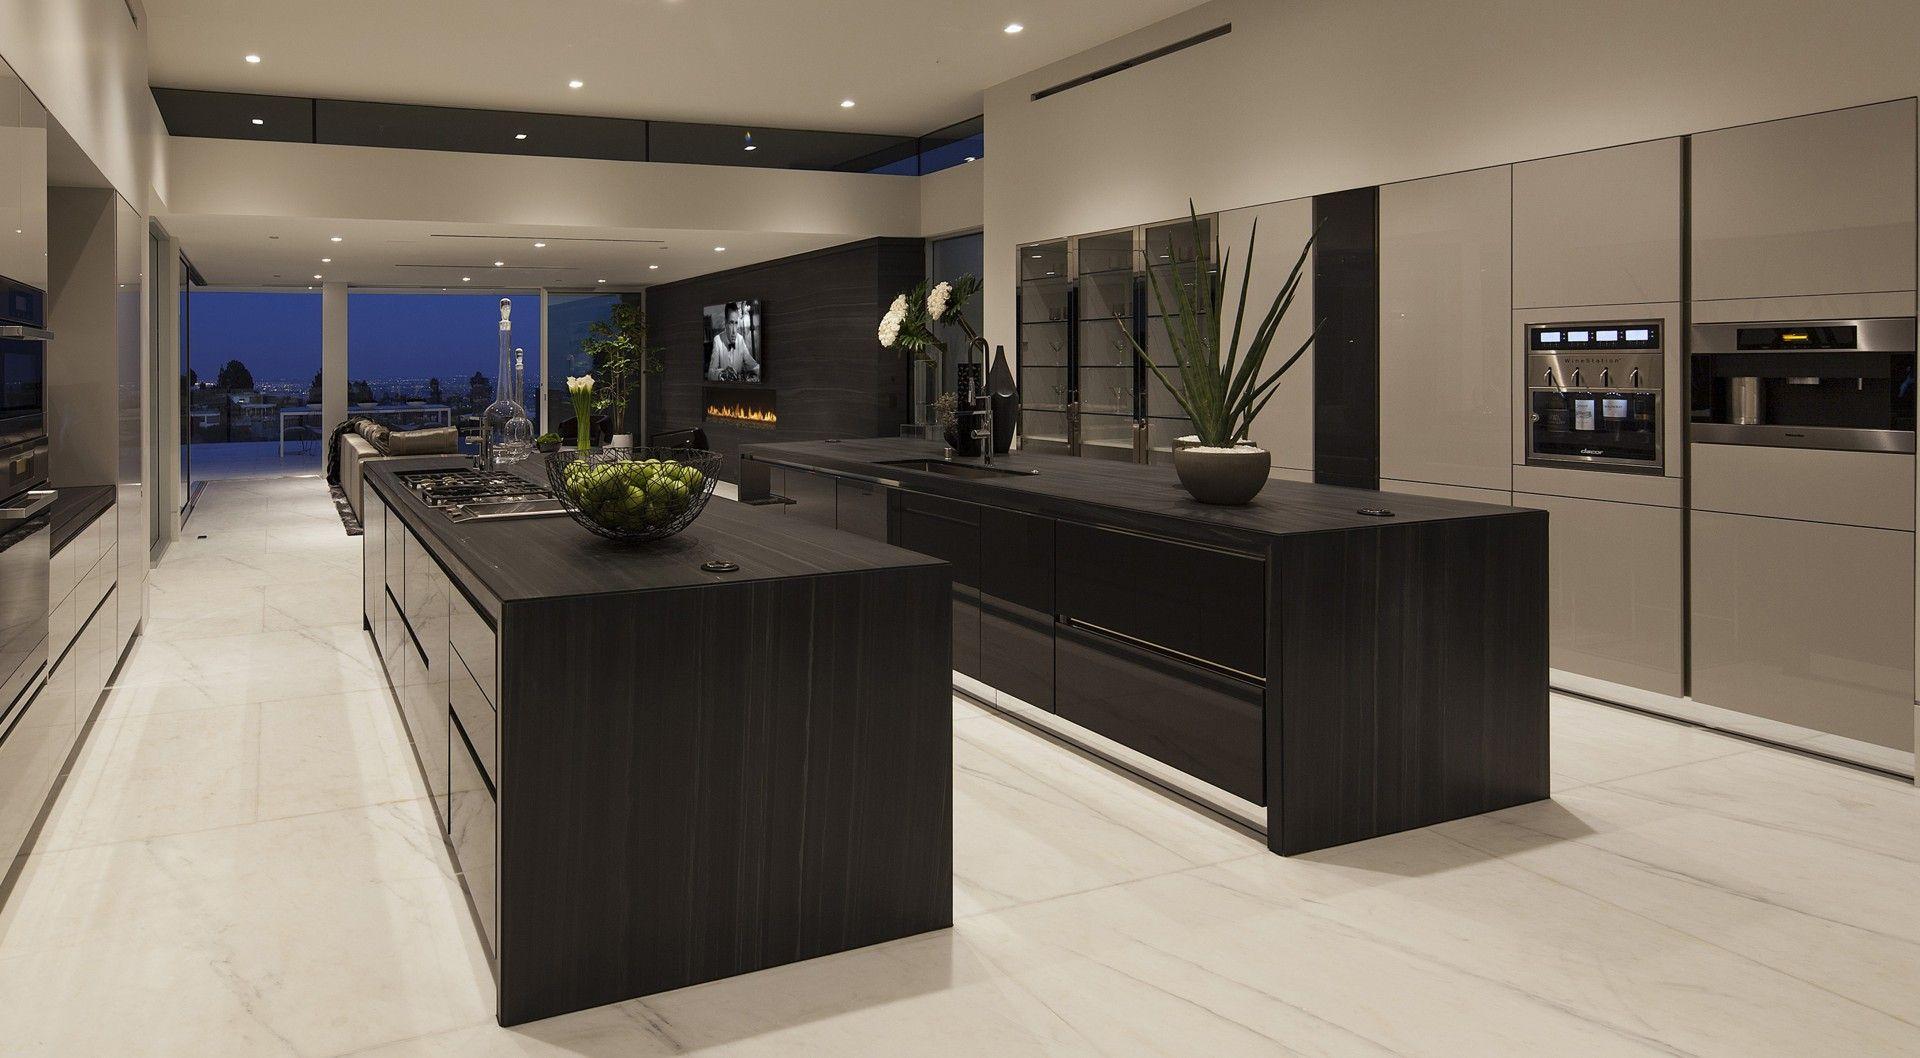 Los Angeles, Laguna Beach Architecture Projects | McClean Design Kitchen  Design, Home Decor Kitchen